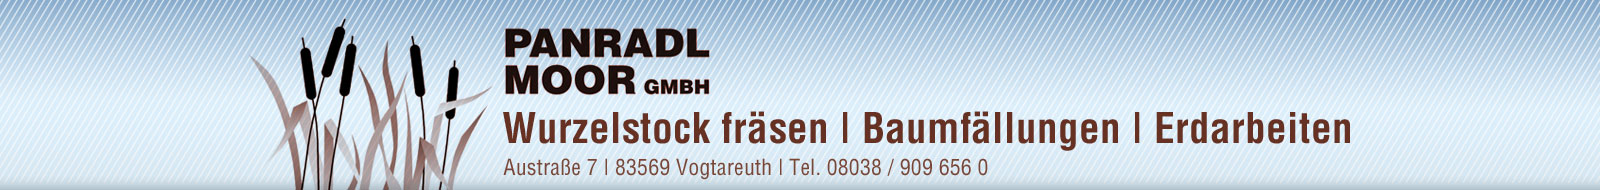 Wurzelstock fräsen, Baumfällungen, Erdarbeiten – Panradl Moor GmbH – Bad Aibling – Rosenheim